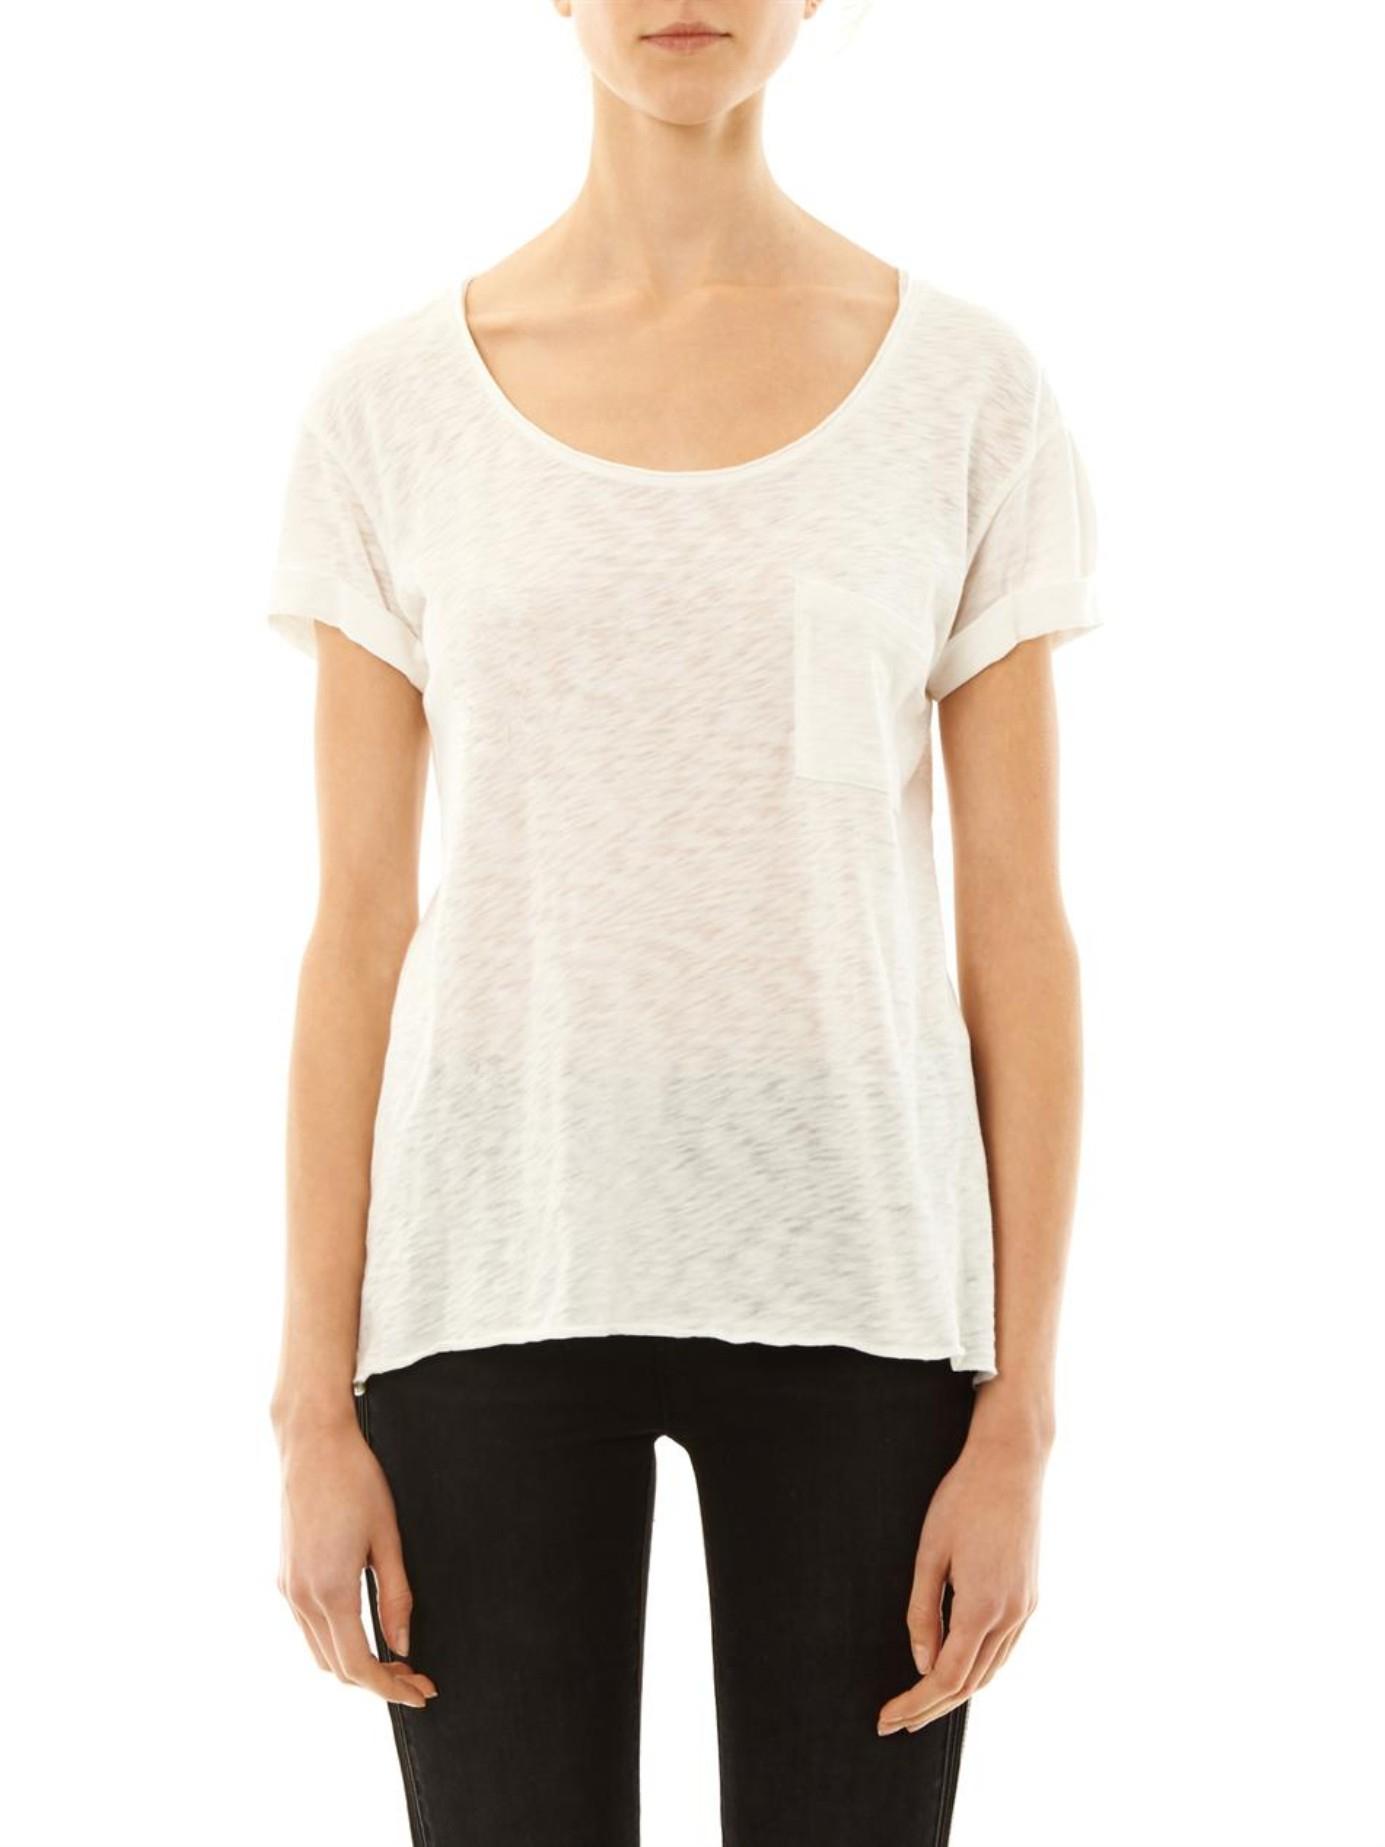 Rag bone the pocket t shirt in white lyst for Rag and bone white t shirt